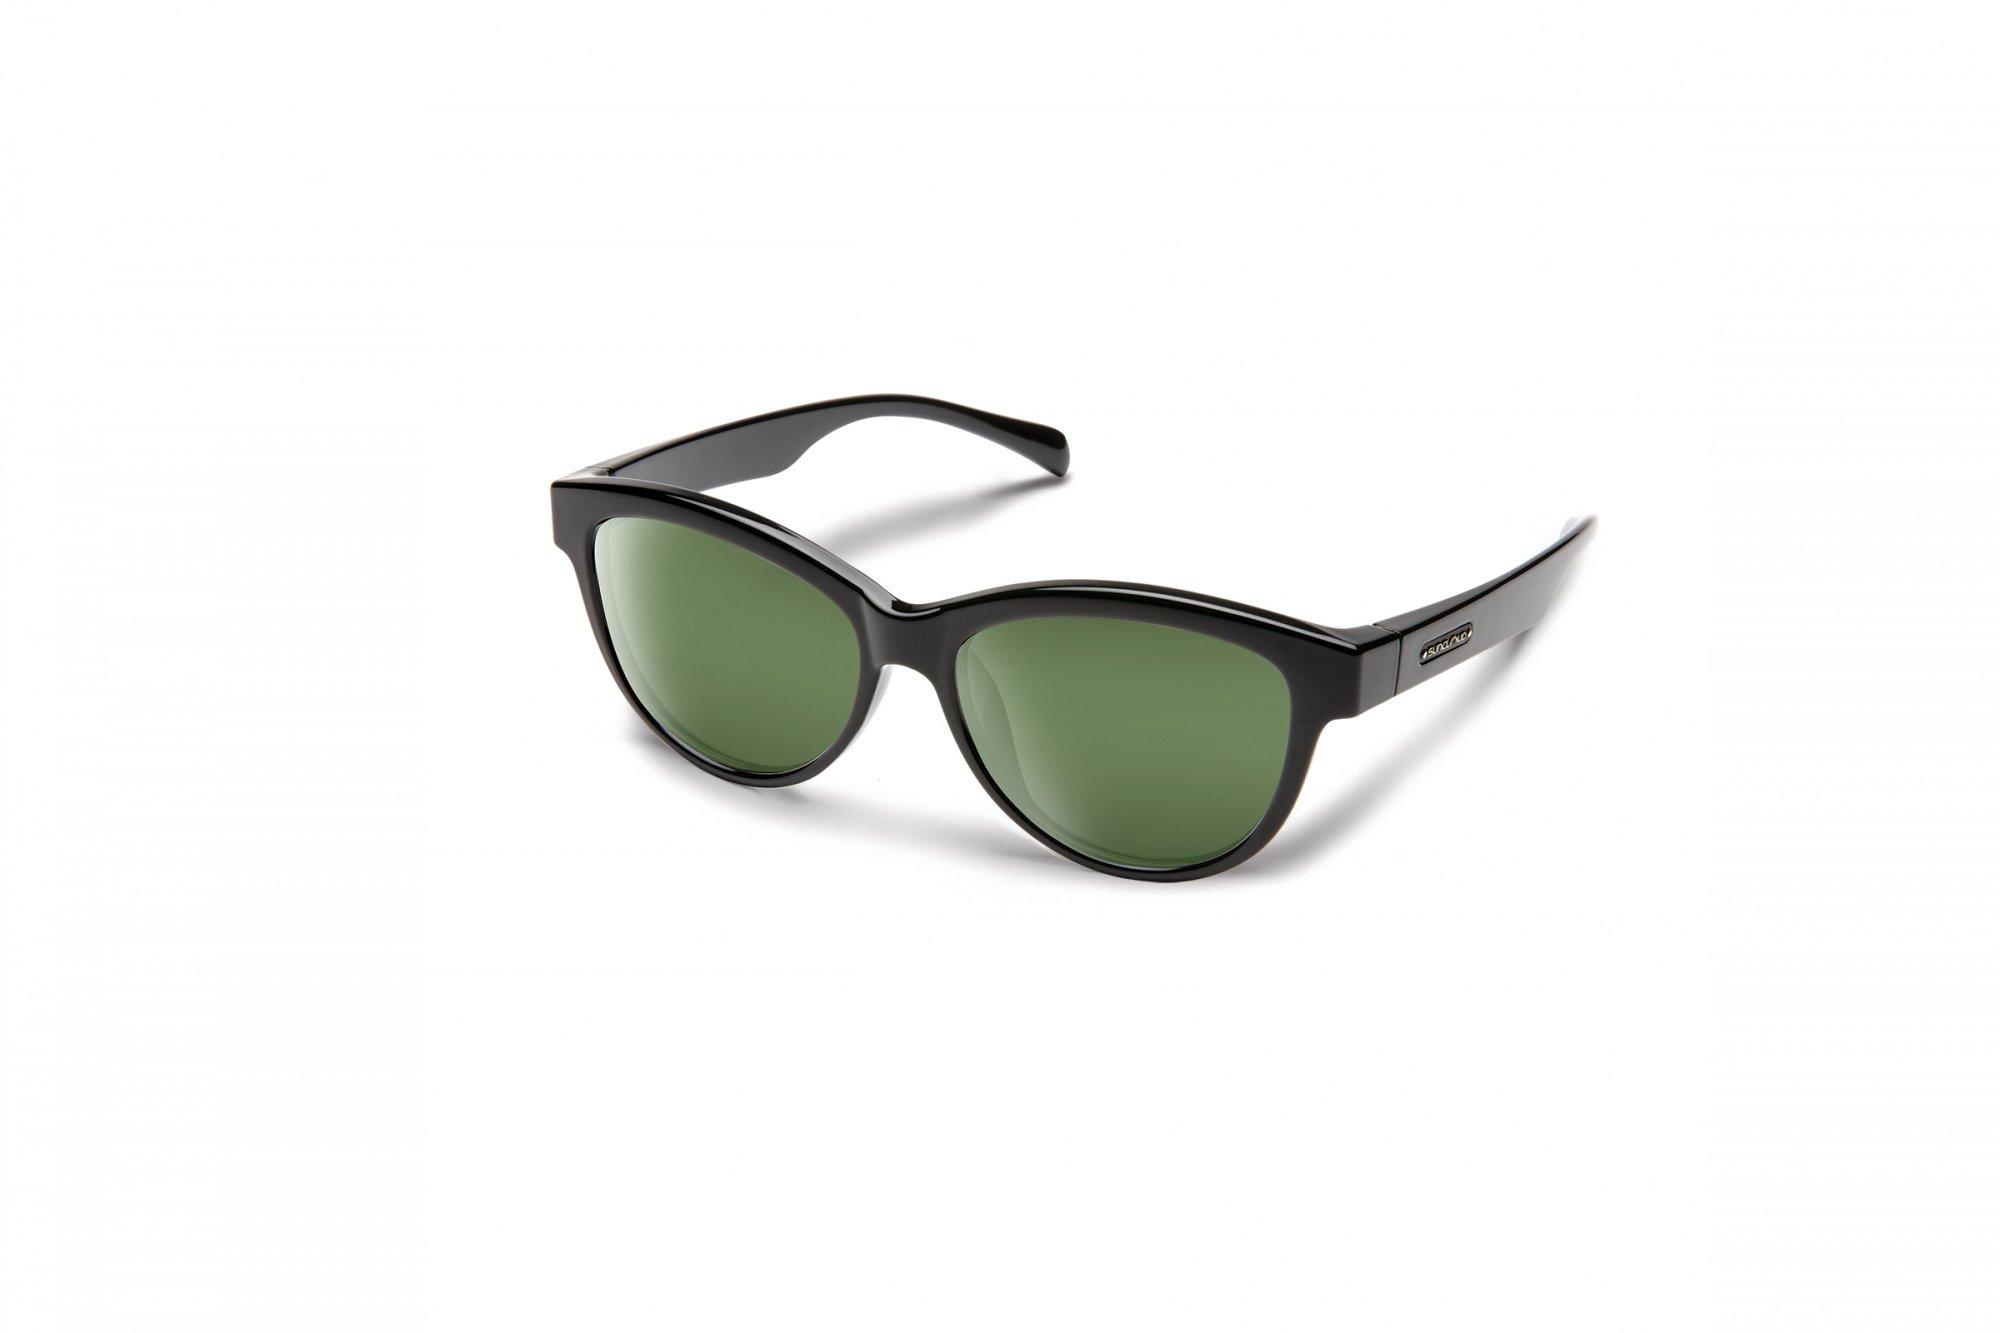 BAYSHORE BLACK GREEN